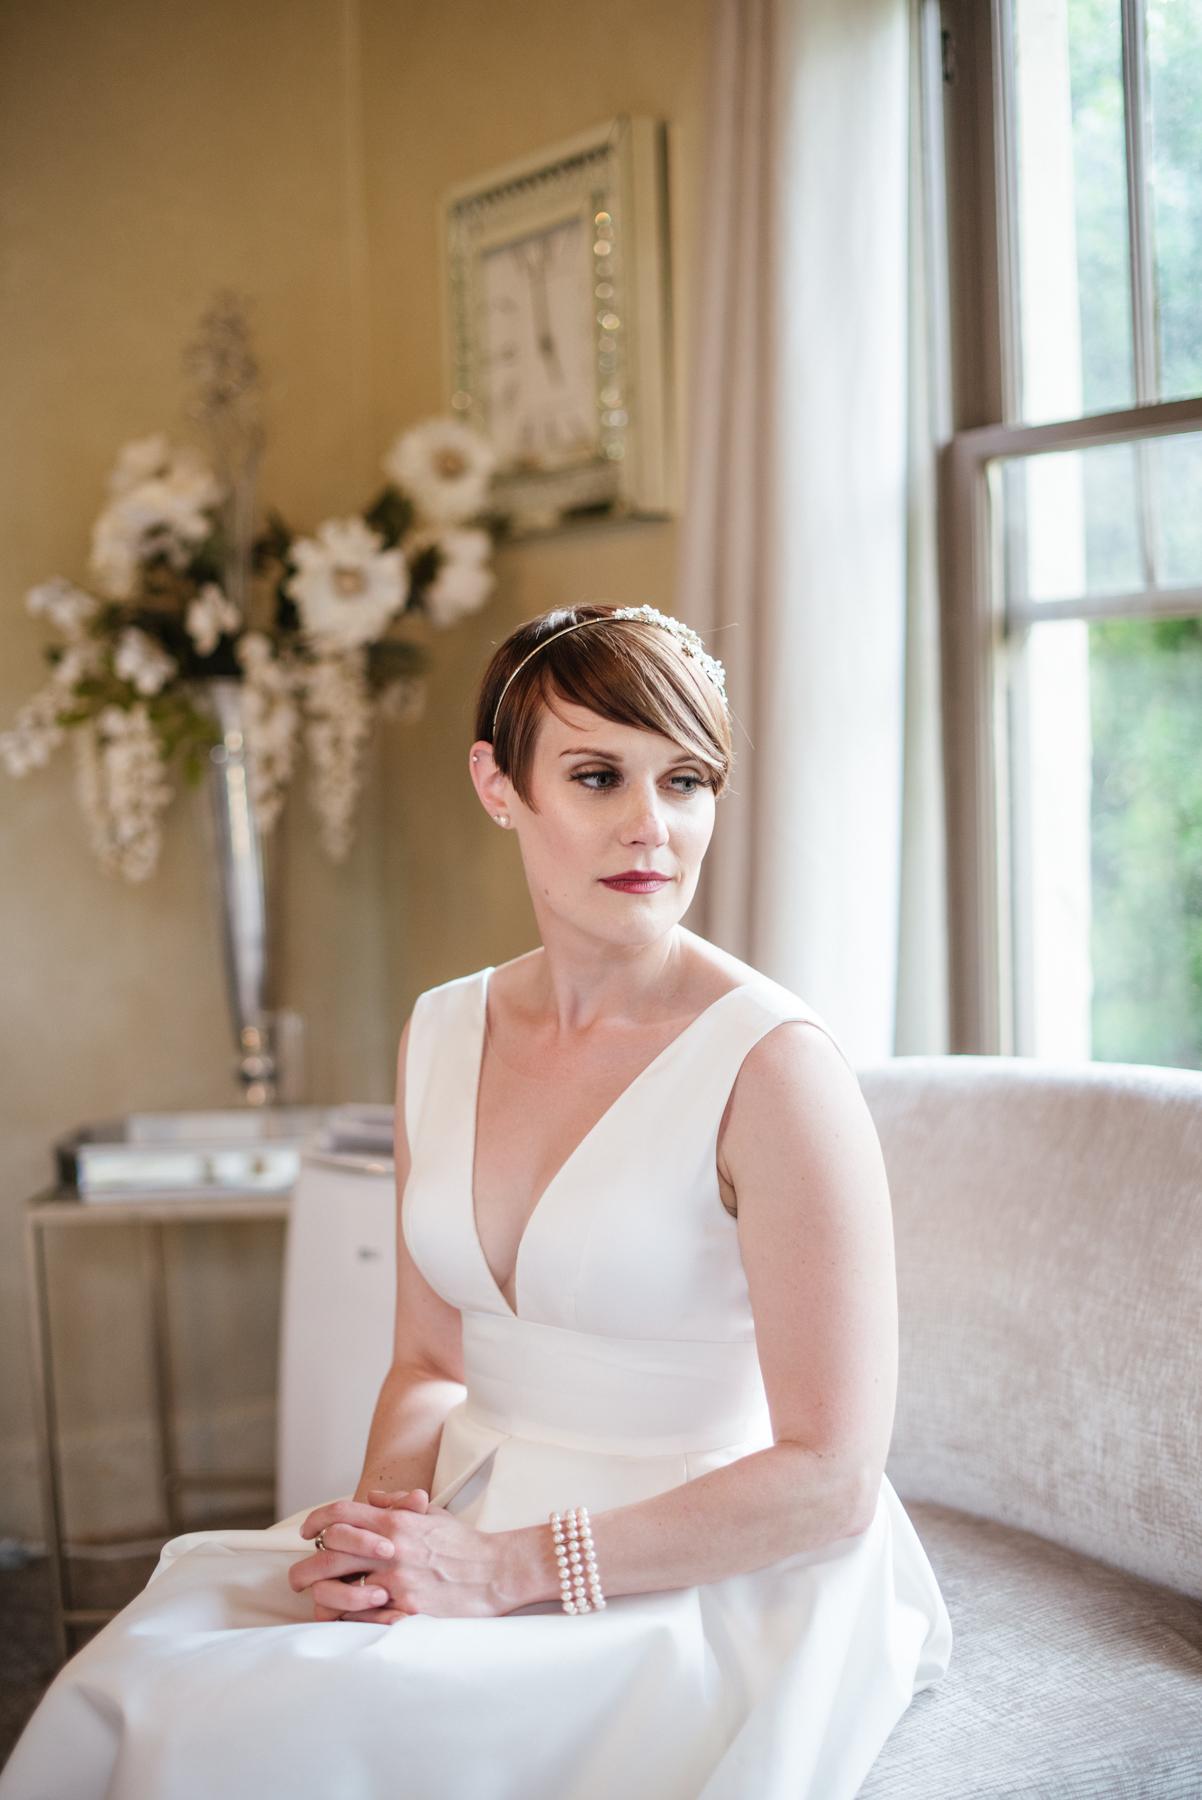 Secret Garden Event Center Wedding - Meredith Amadee Photography-18-2.jpg